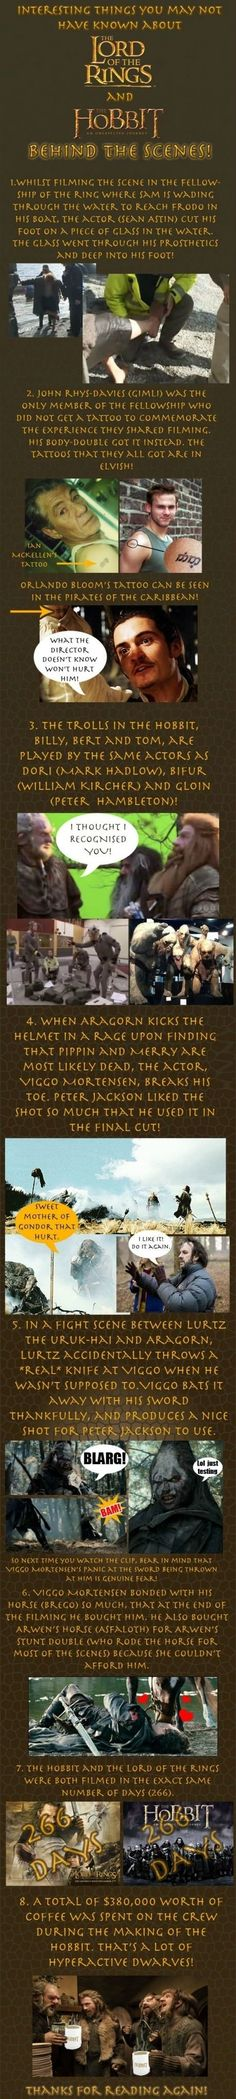 Some LOTR & Hobbit trivia. - Imgur